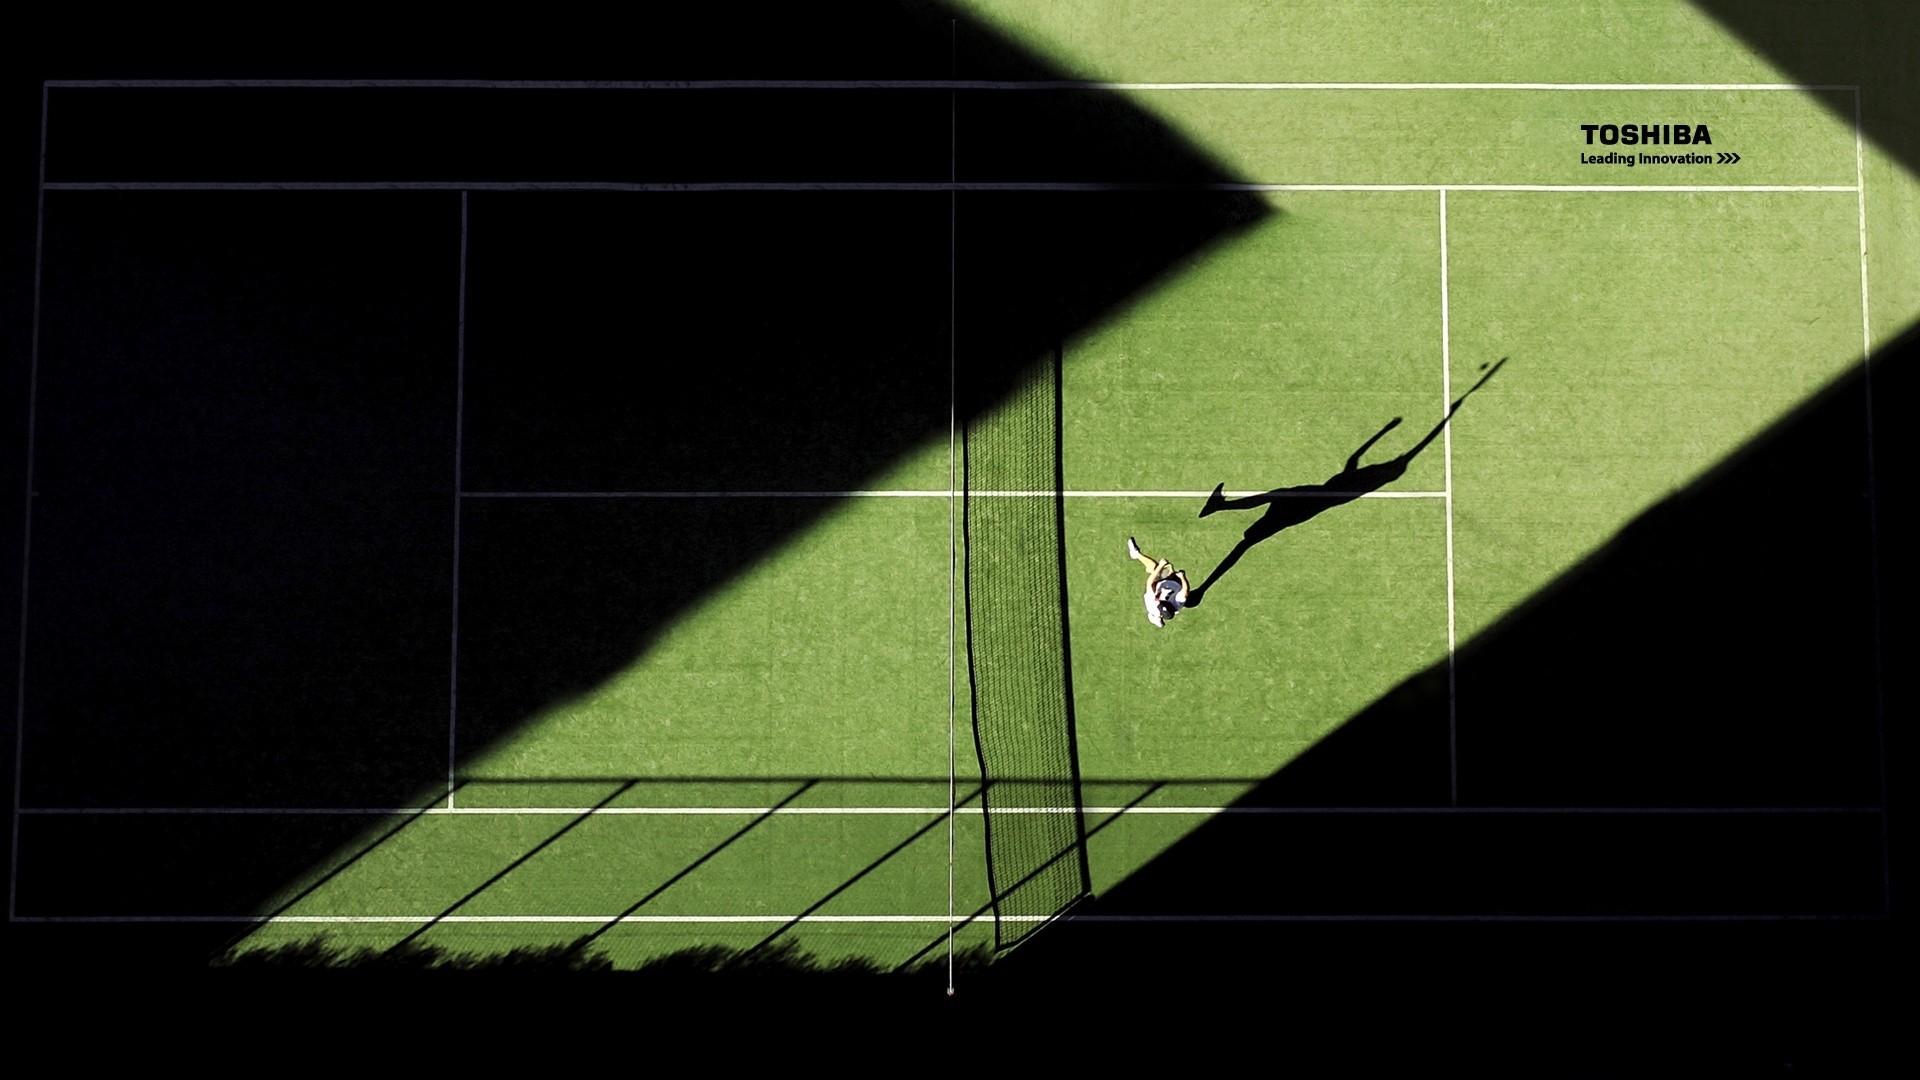 https://2.bp.blogspot.com/-tCybWCukOqw/UDDKw5XFpNI. Toshiba tennis – High  Definition Wallpapers – HD wallpapers